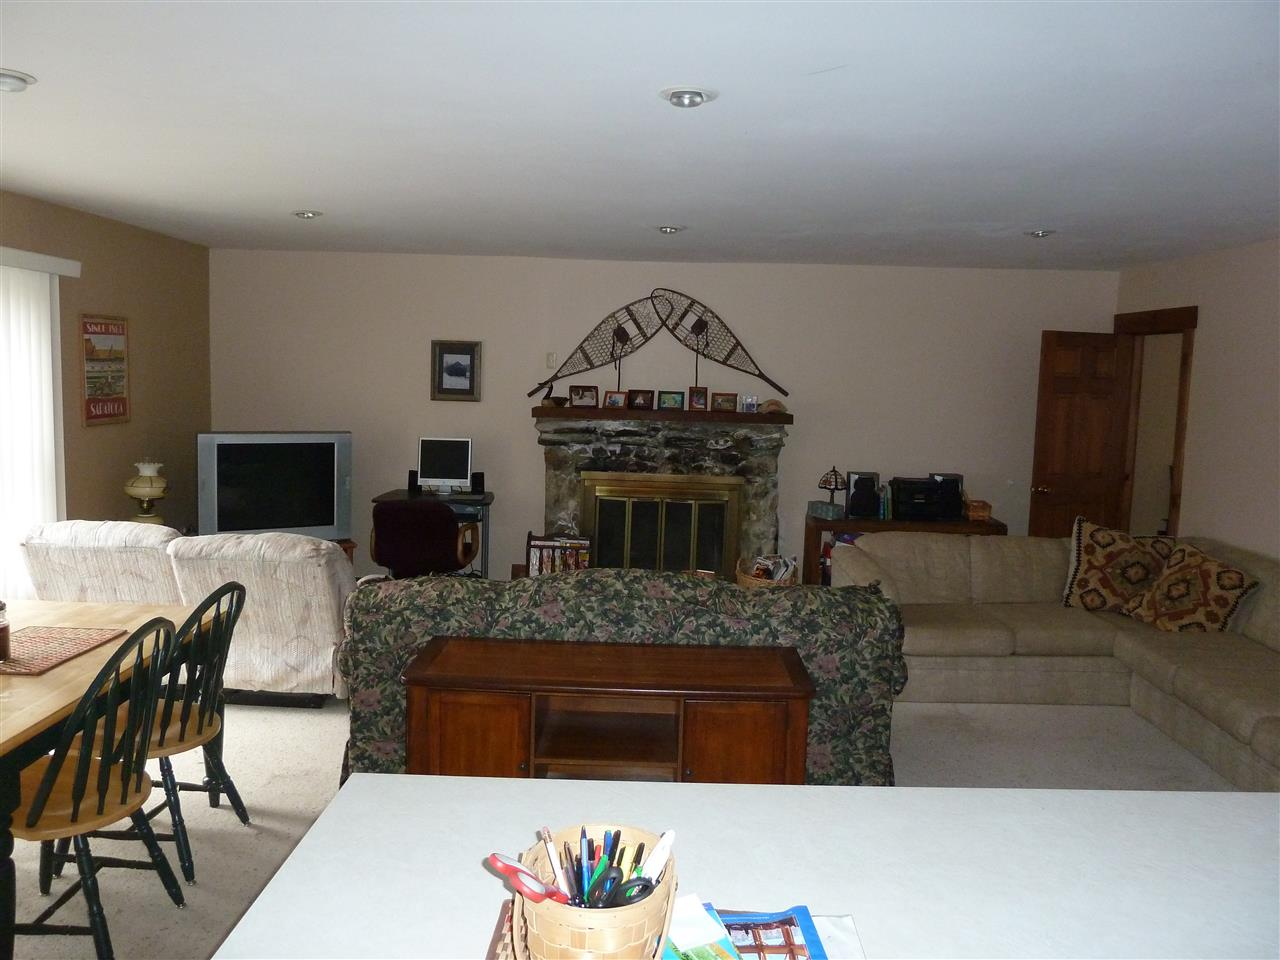 Mount-Snow-Real-Estate-4627390-7